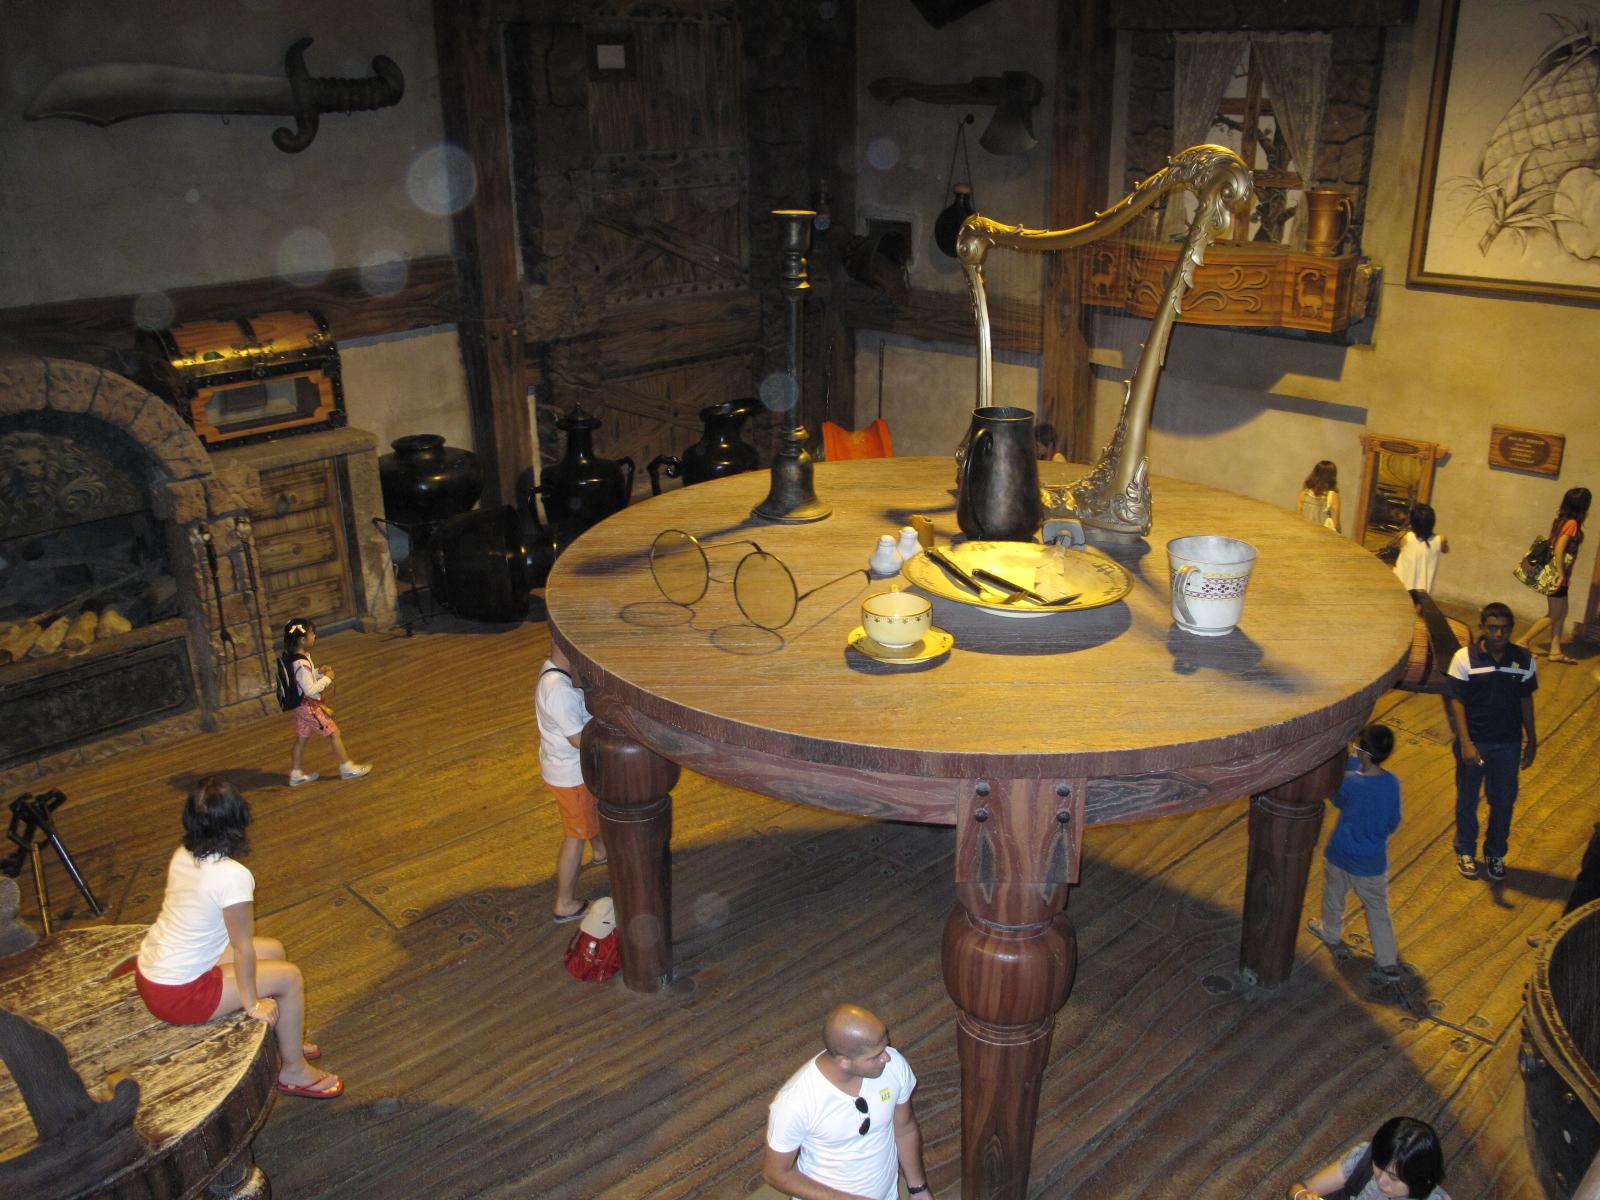 golden power chair gravity walmart crave's favorites: giant house | cravecoasters